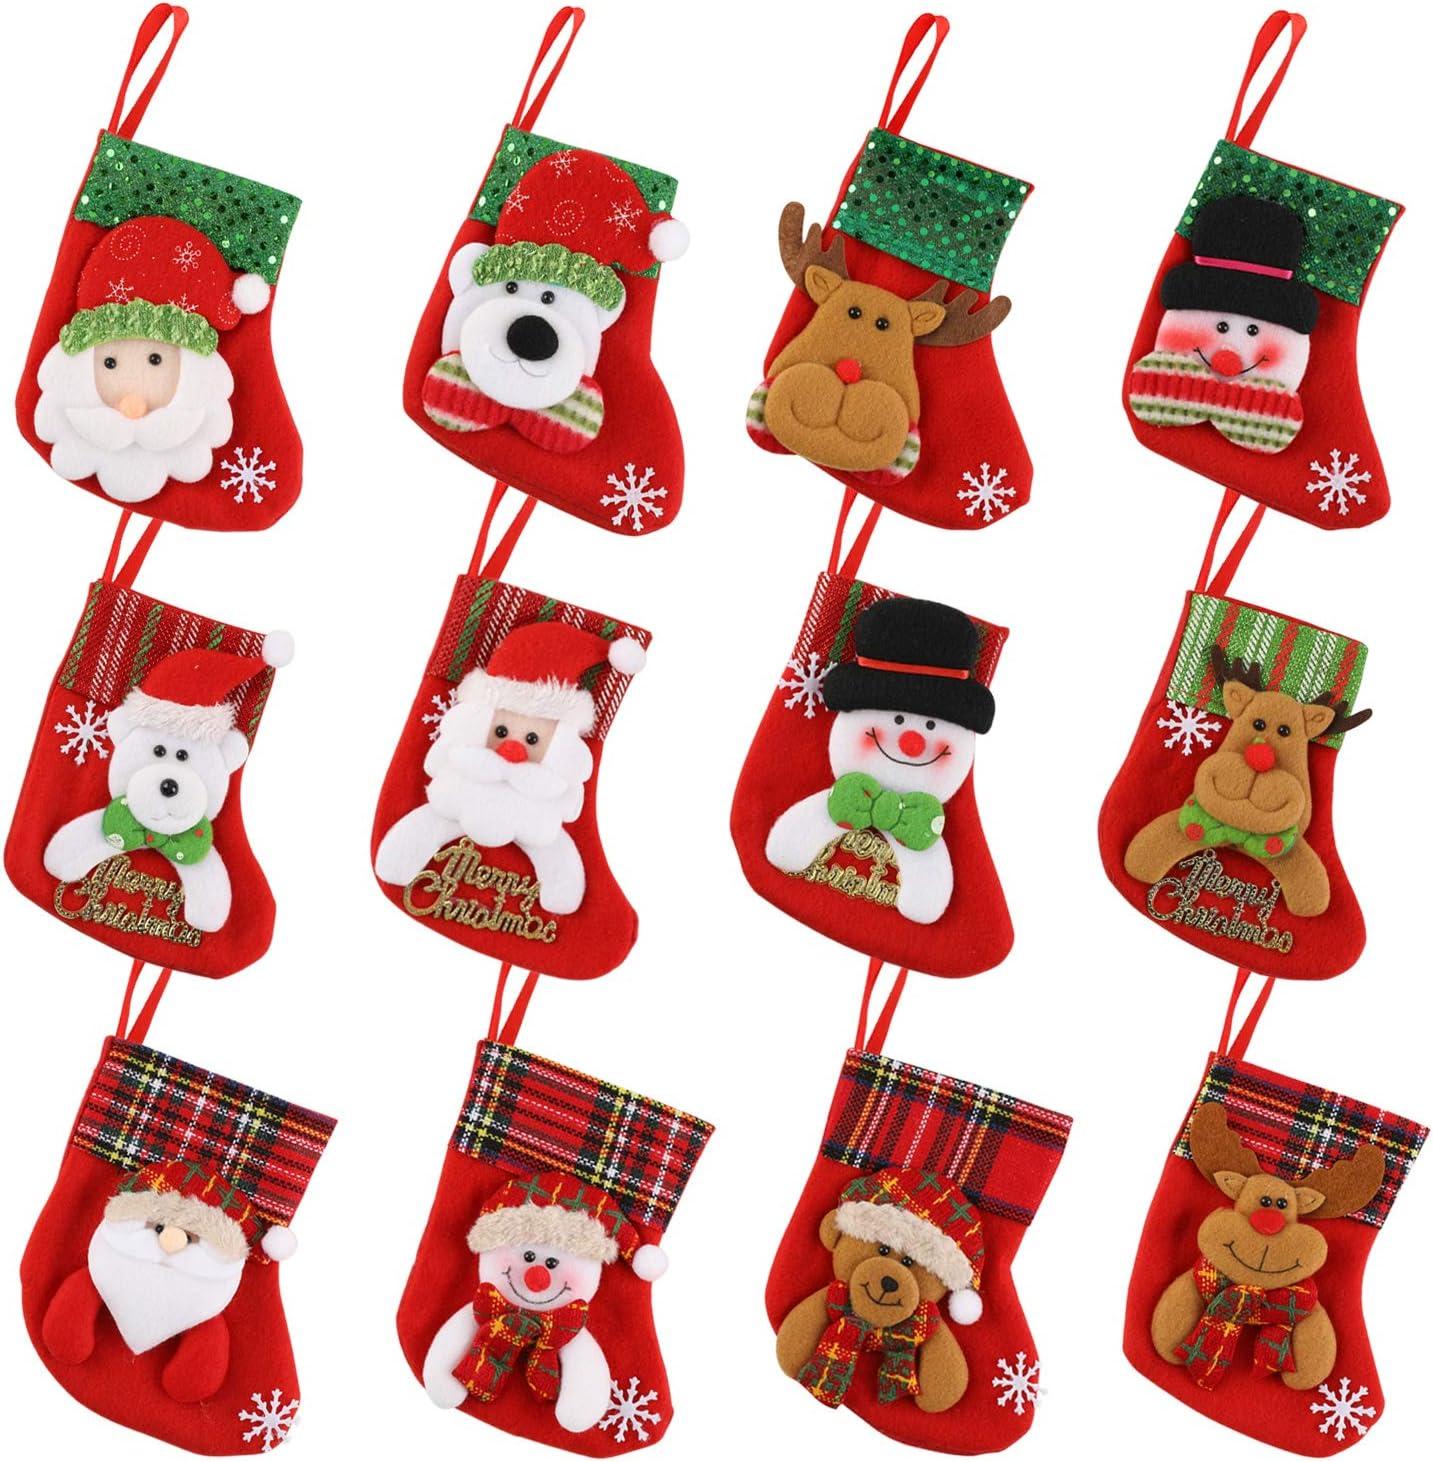 HOWAF Mini Christmas Stockings 12 Pack 6 Small Xmas Stockings Santa Snowman Reindeer Kids Goodie Bags Christmas Tree Decorations Dinner Table Ornaments